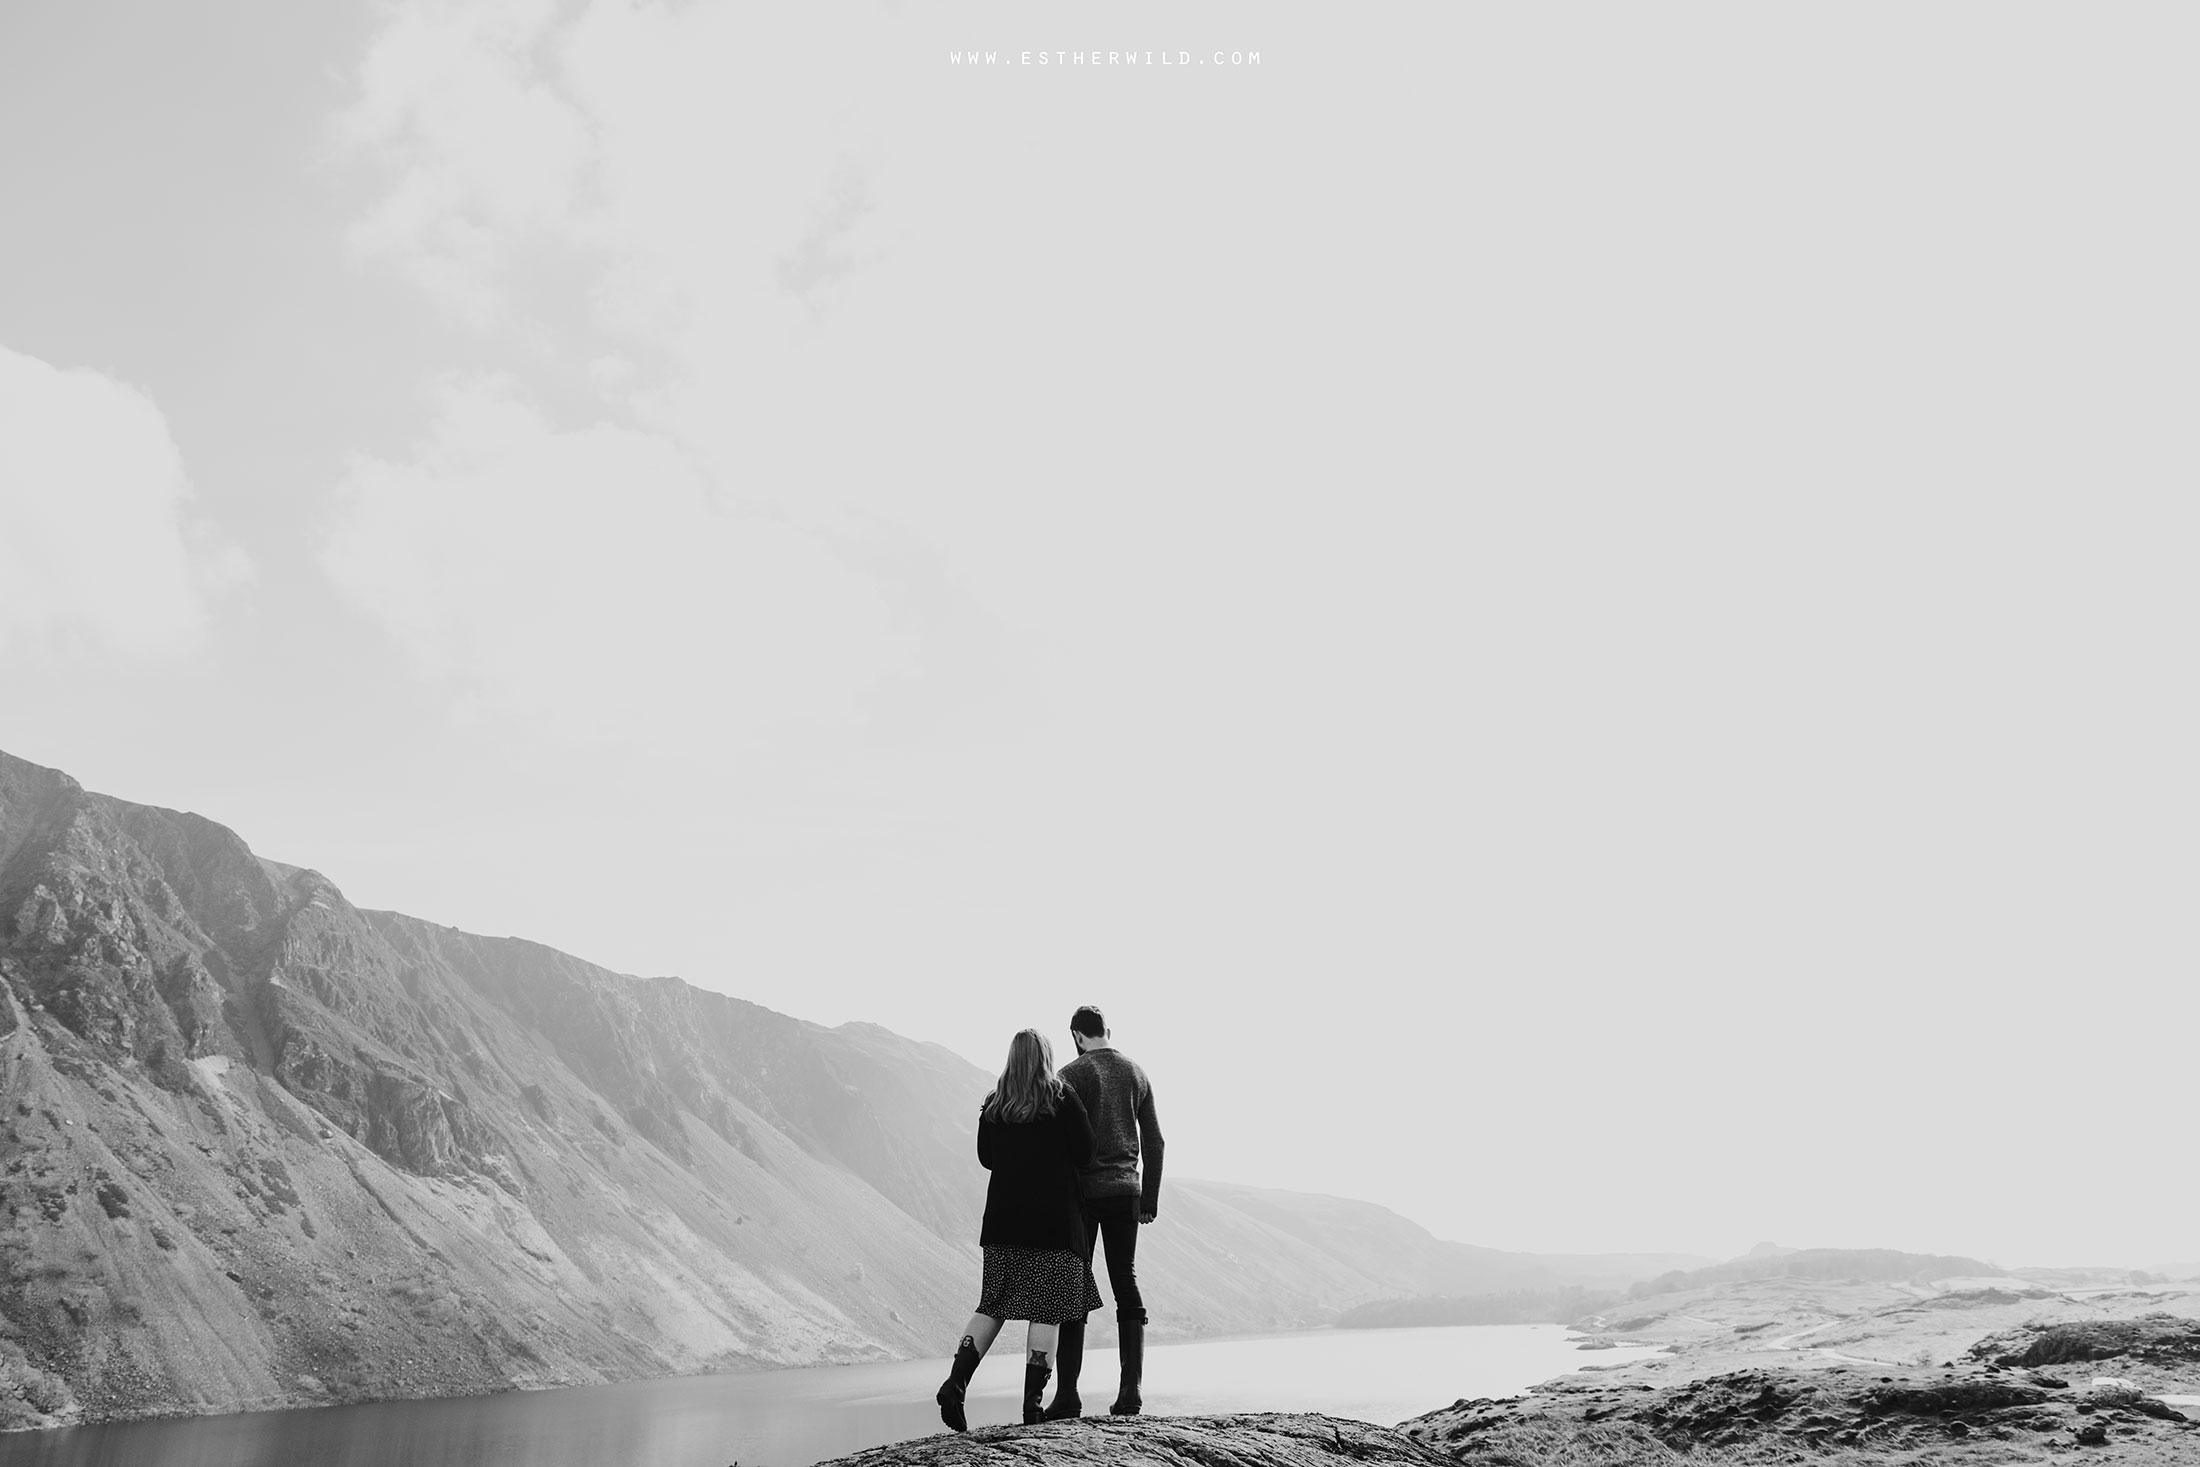 Cumbria_Lake_District_Wasdale_Wedding_Photographer_Destination_Engagement_Anniversary_Esther_Wild_IMG_3191.jpg